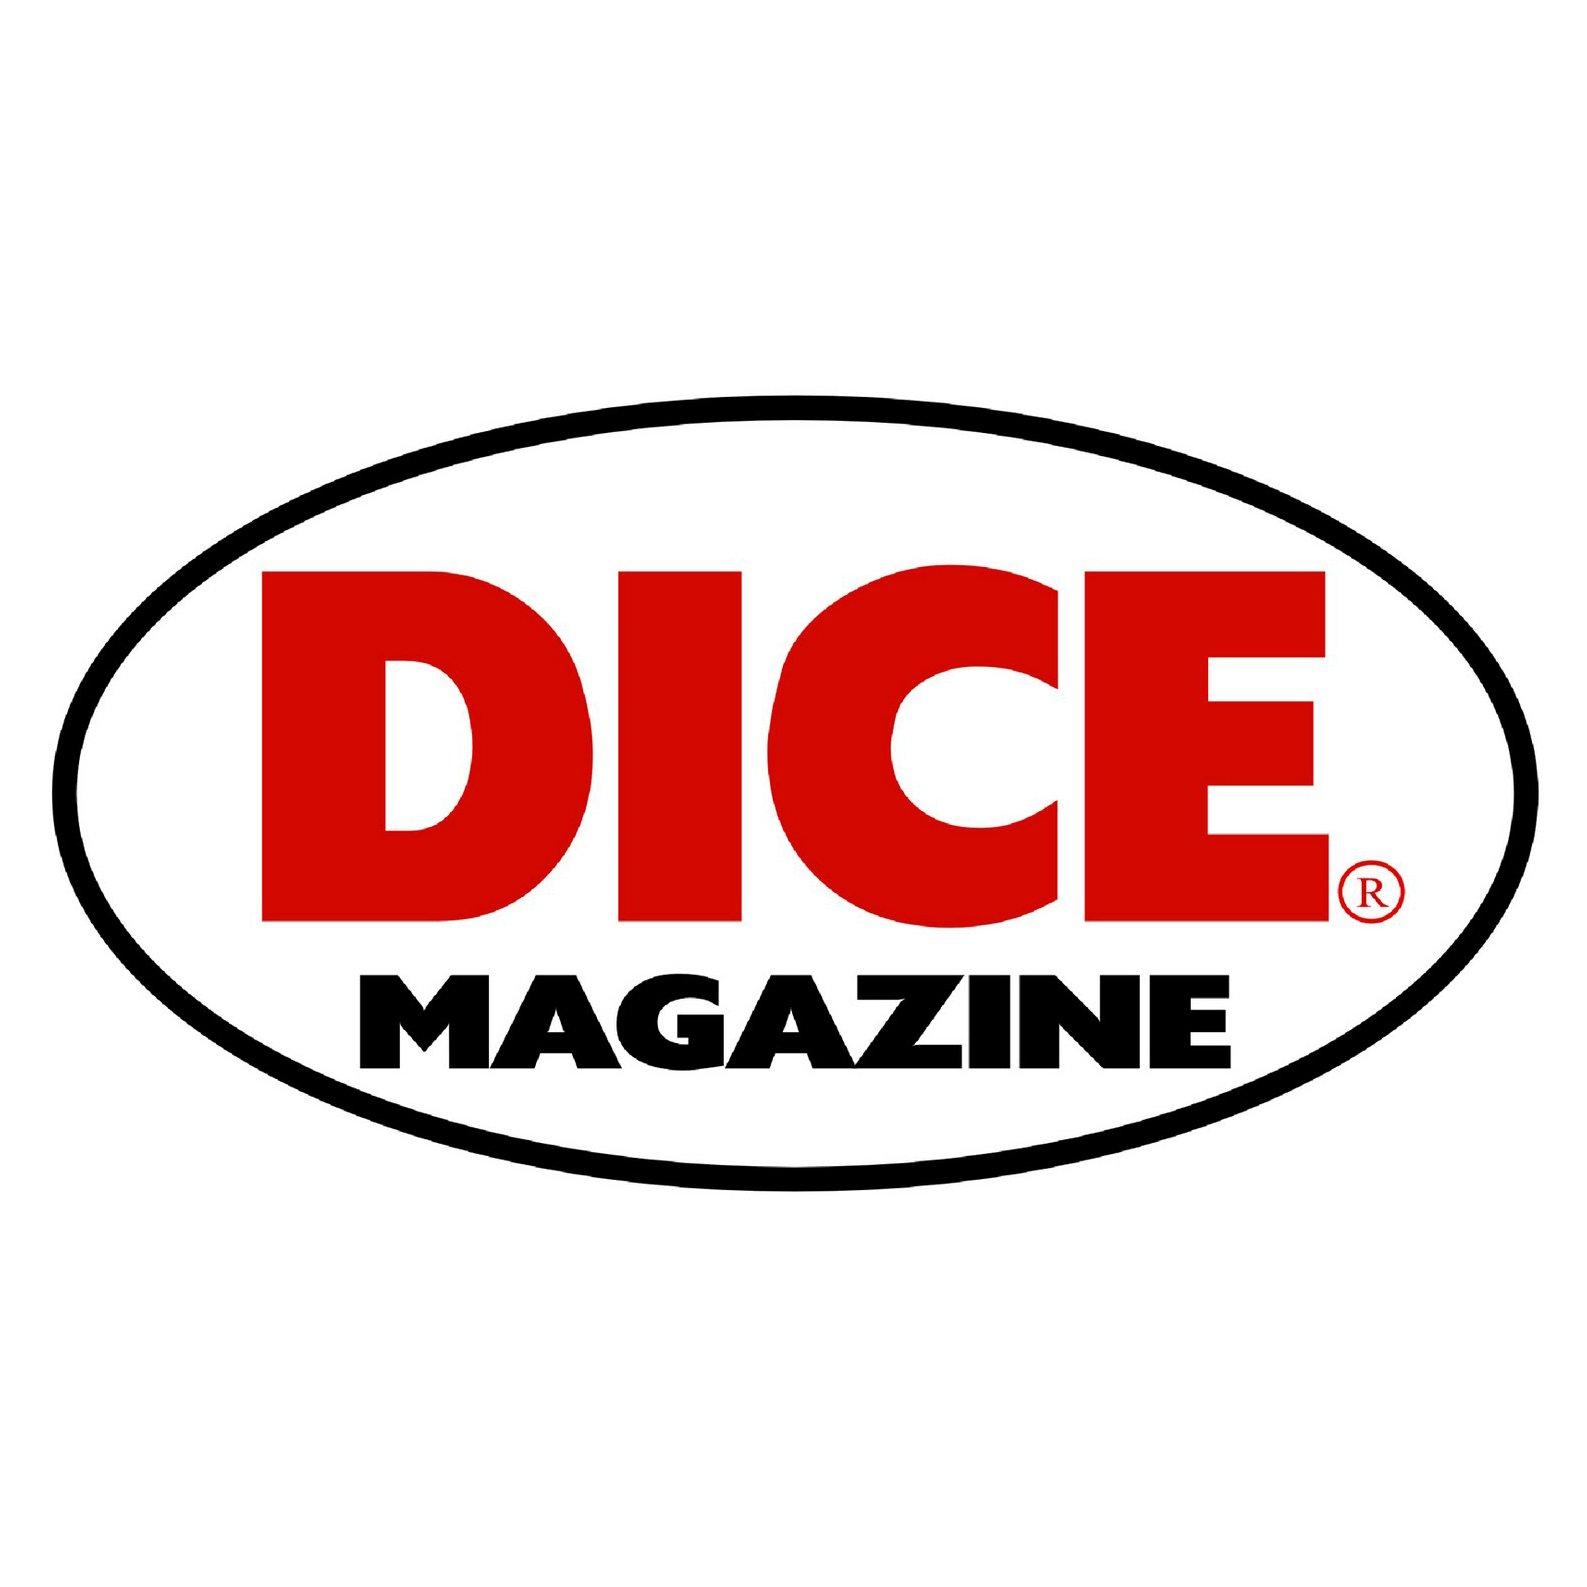 dice-magazine-logo.jpg